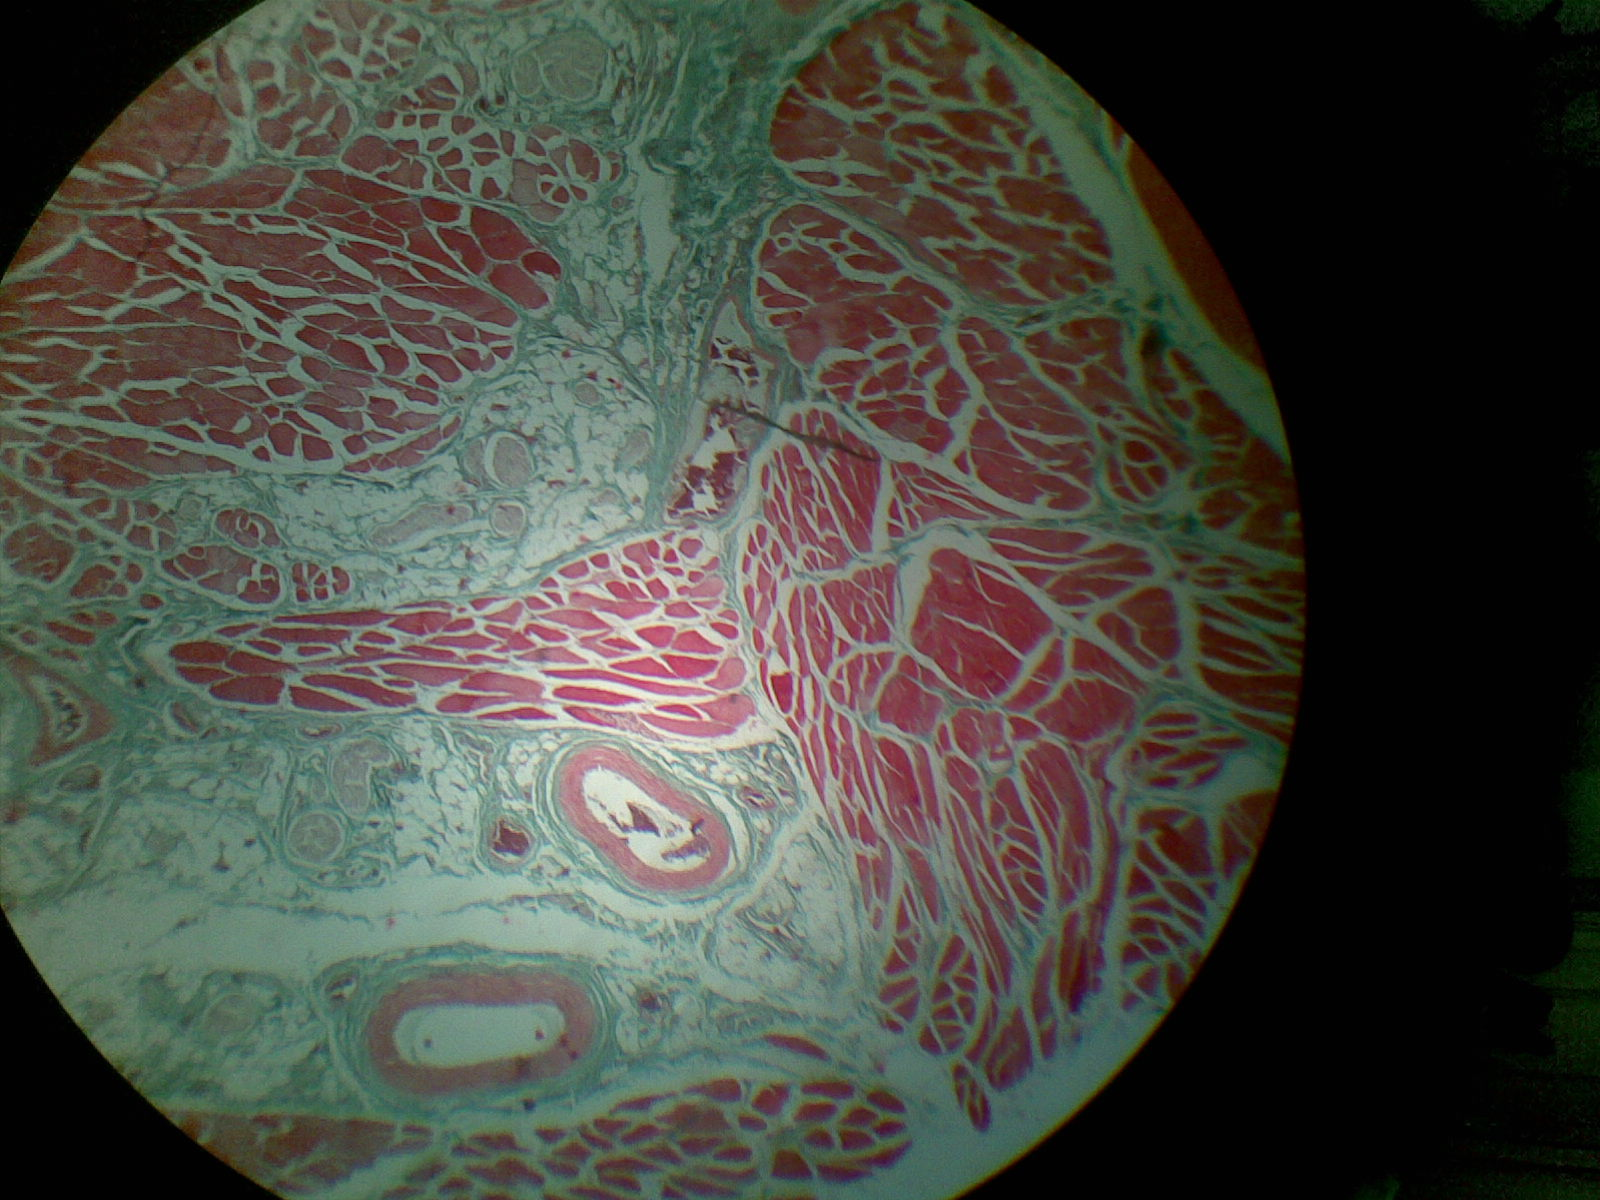 Anatomía Patológica: Tejido Muscular Estriado (Lengua)